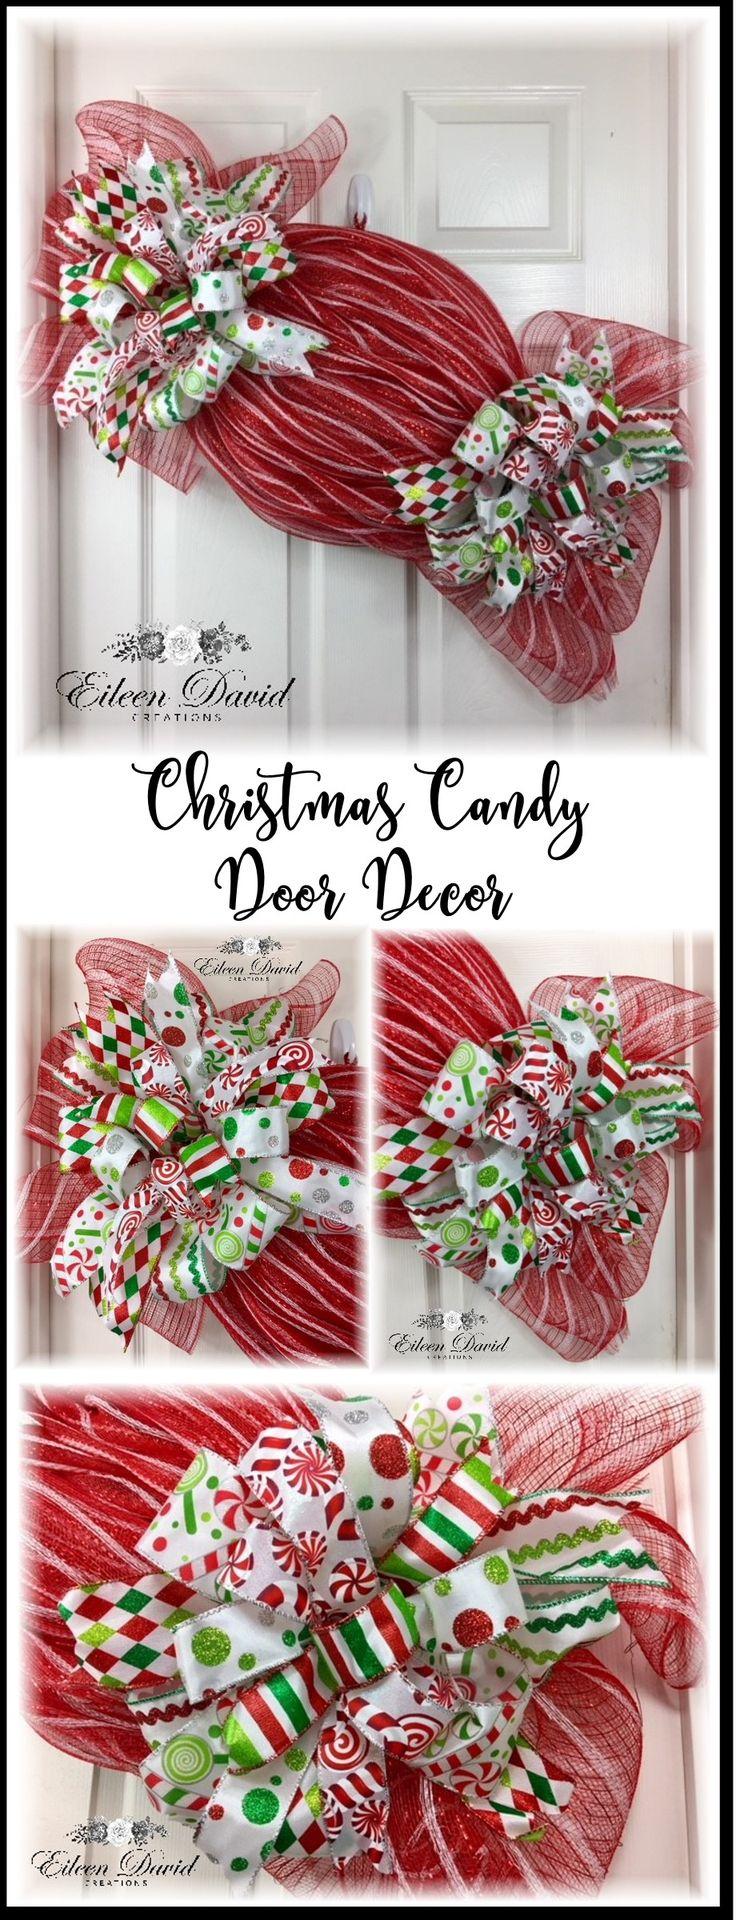 Christmas Candy wall decor, Christmas Decorations, red decor, Christmas wreaths,